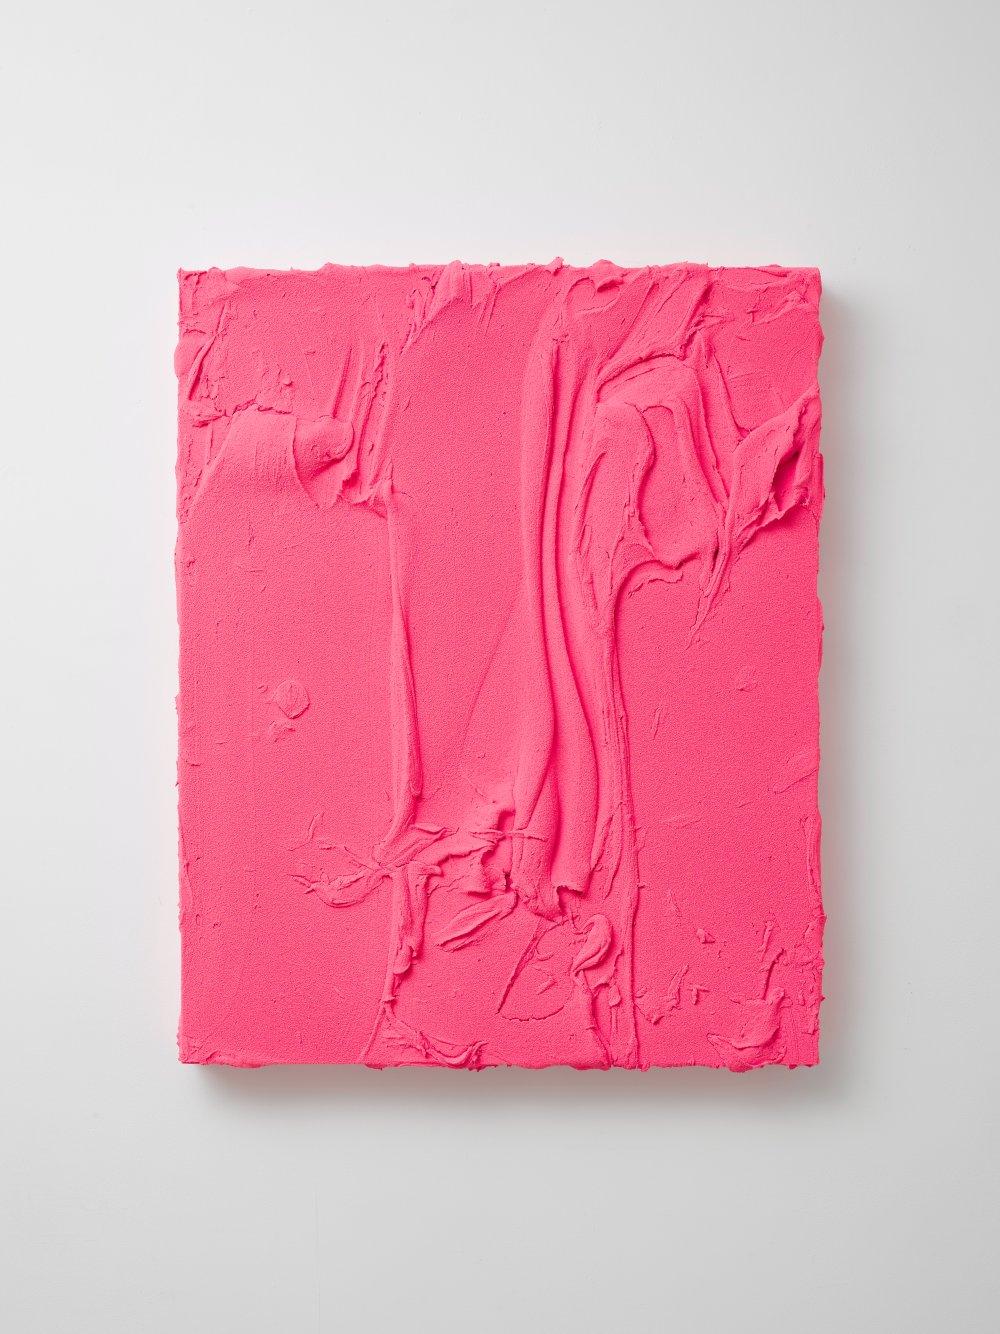 Untitled (Fluorescent pink / Titanium white)